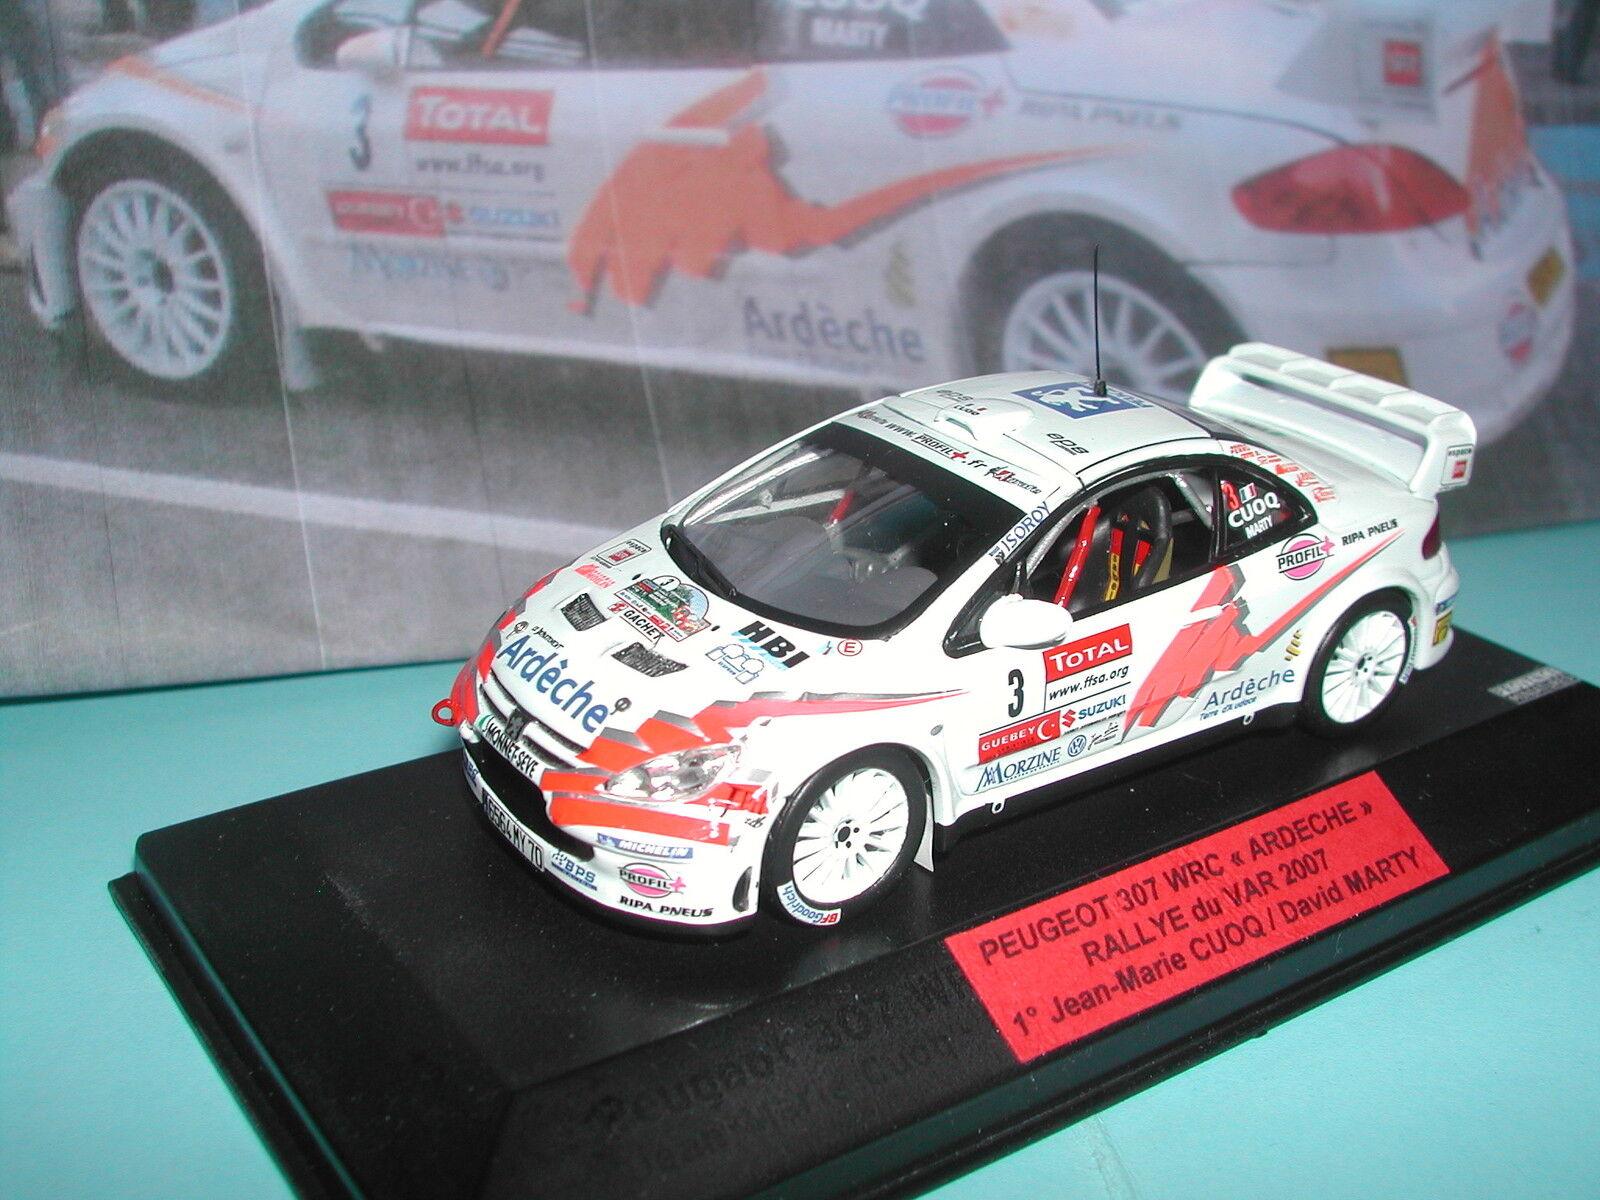 PEUGEOT 307 WRC CUOQ ARDECHE 1° VAR 2007 PRO HANDBUILT IXO  PROVENCE MINIATURE